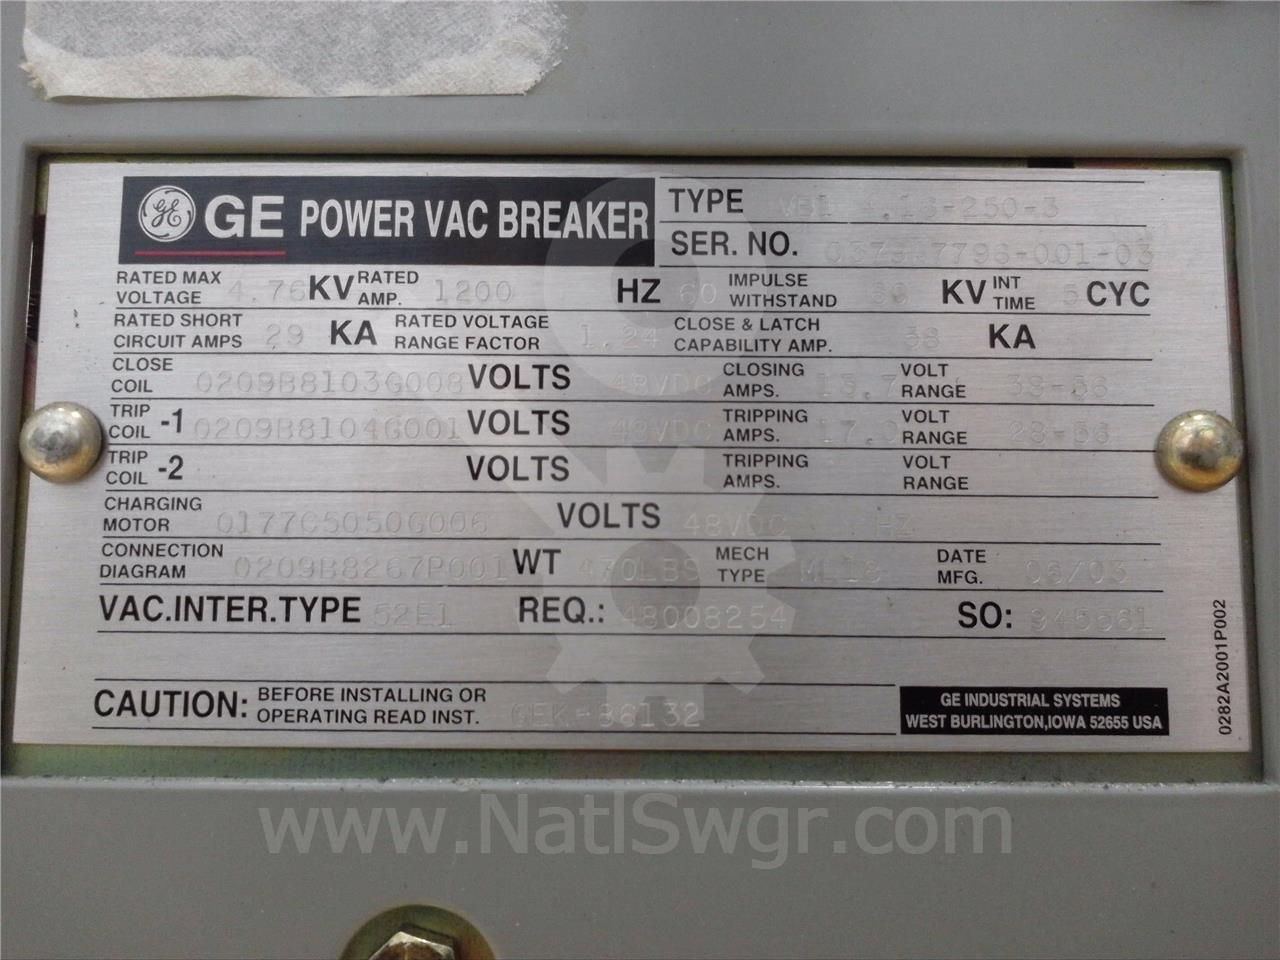 General Electric 1200A GE VB1 4.16-250-3 ML-18